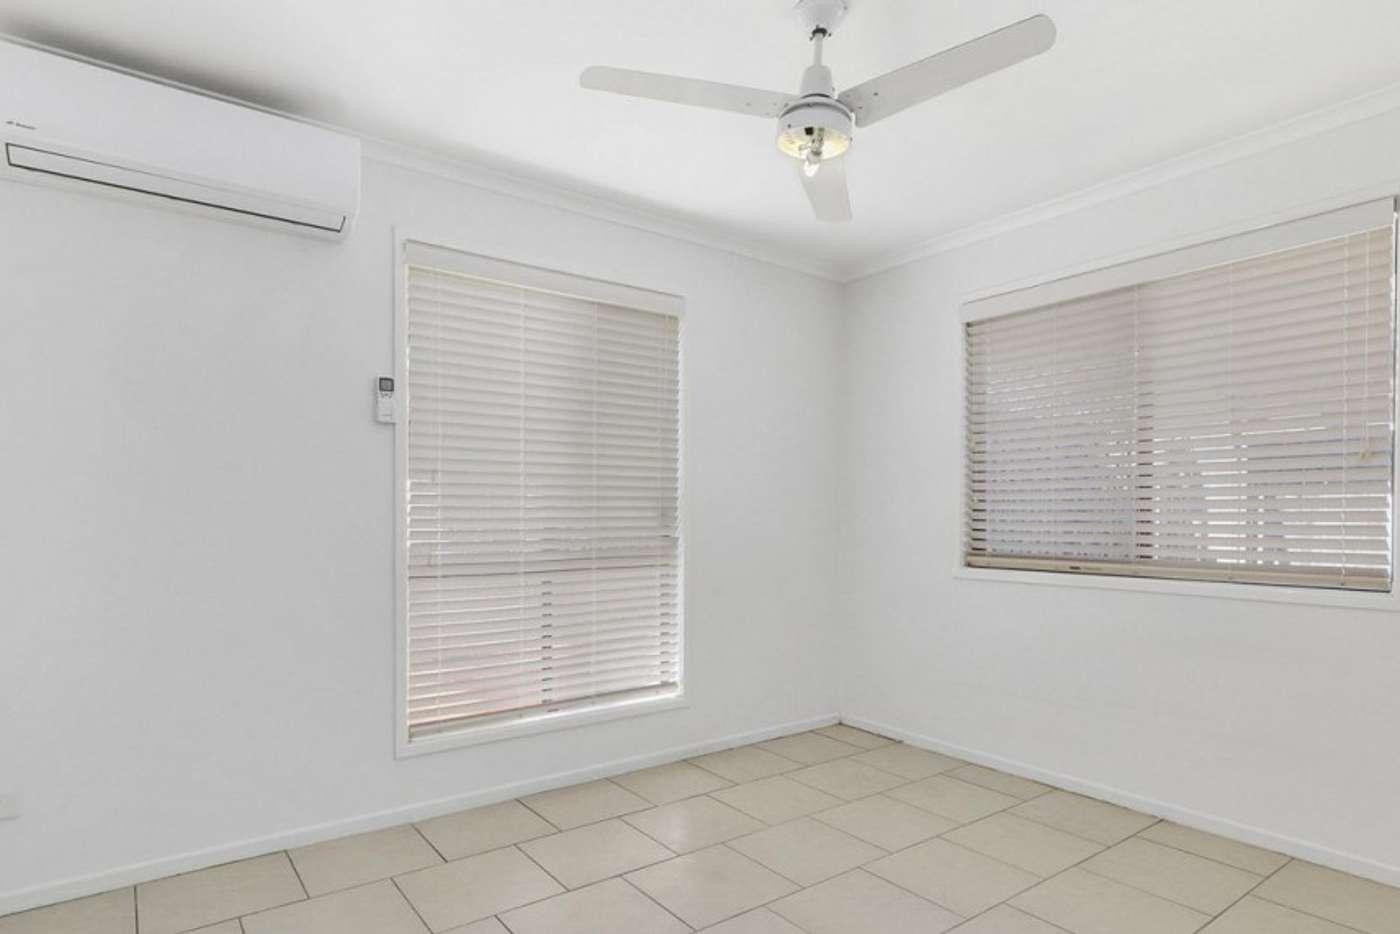 Seventh view of Homely house listing, 144 Mooroondu Road, Thorneside QLD 4158